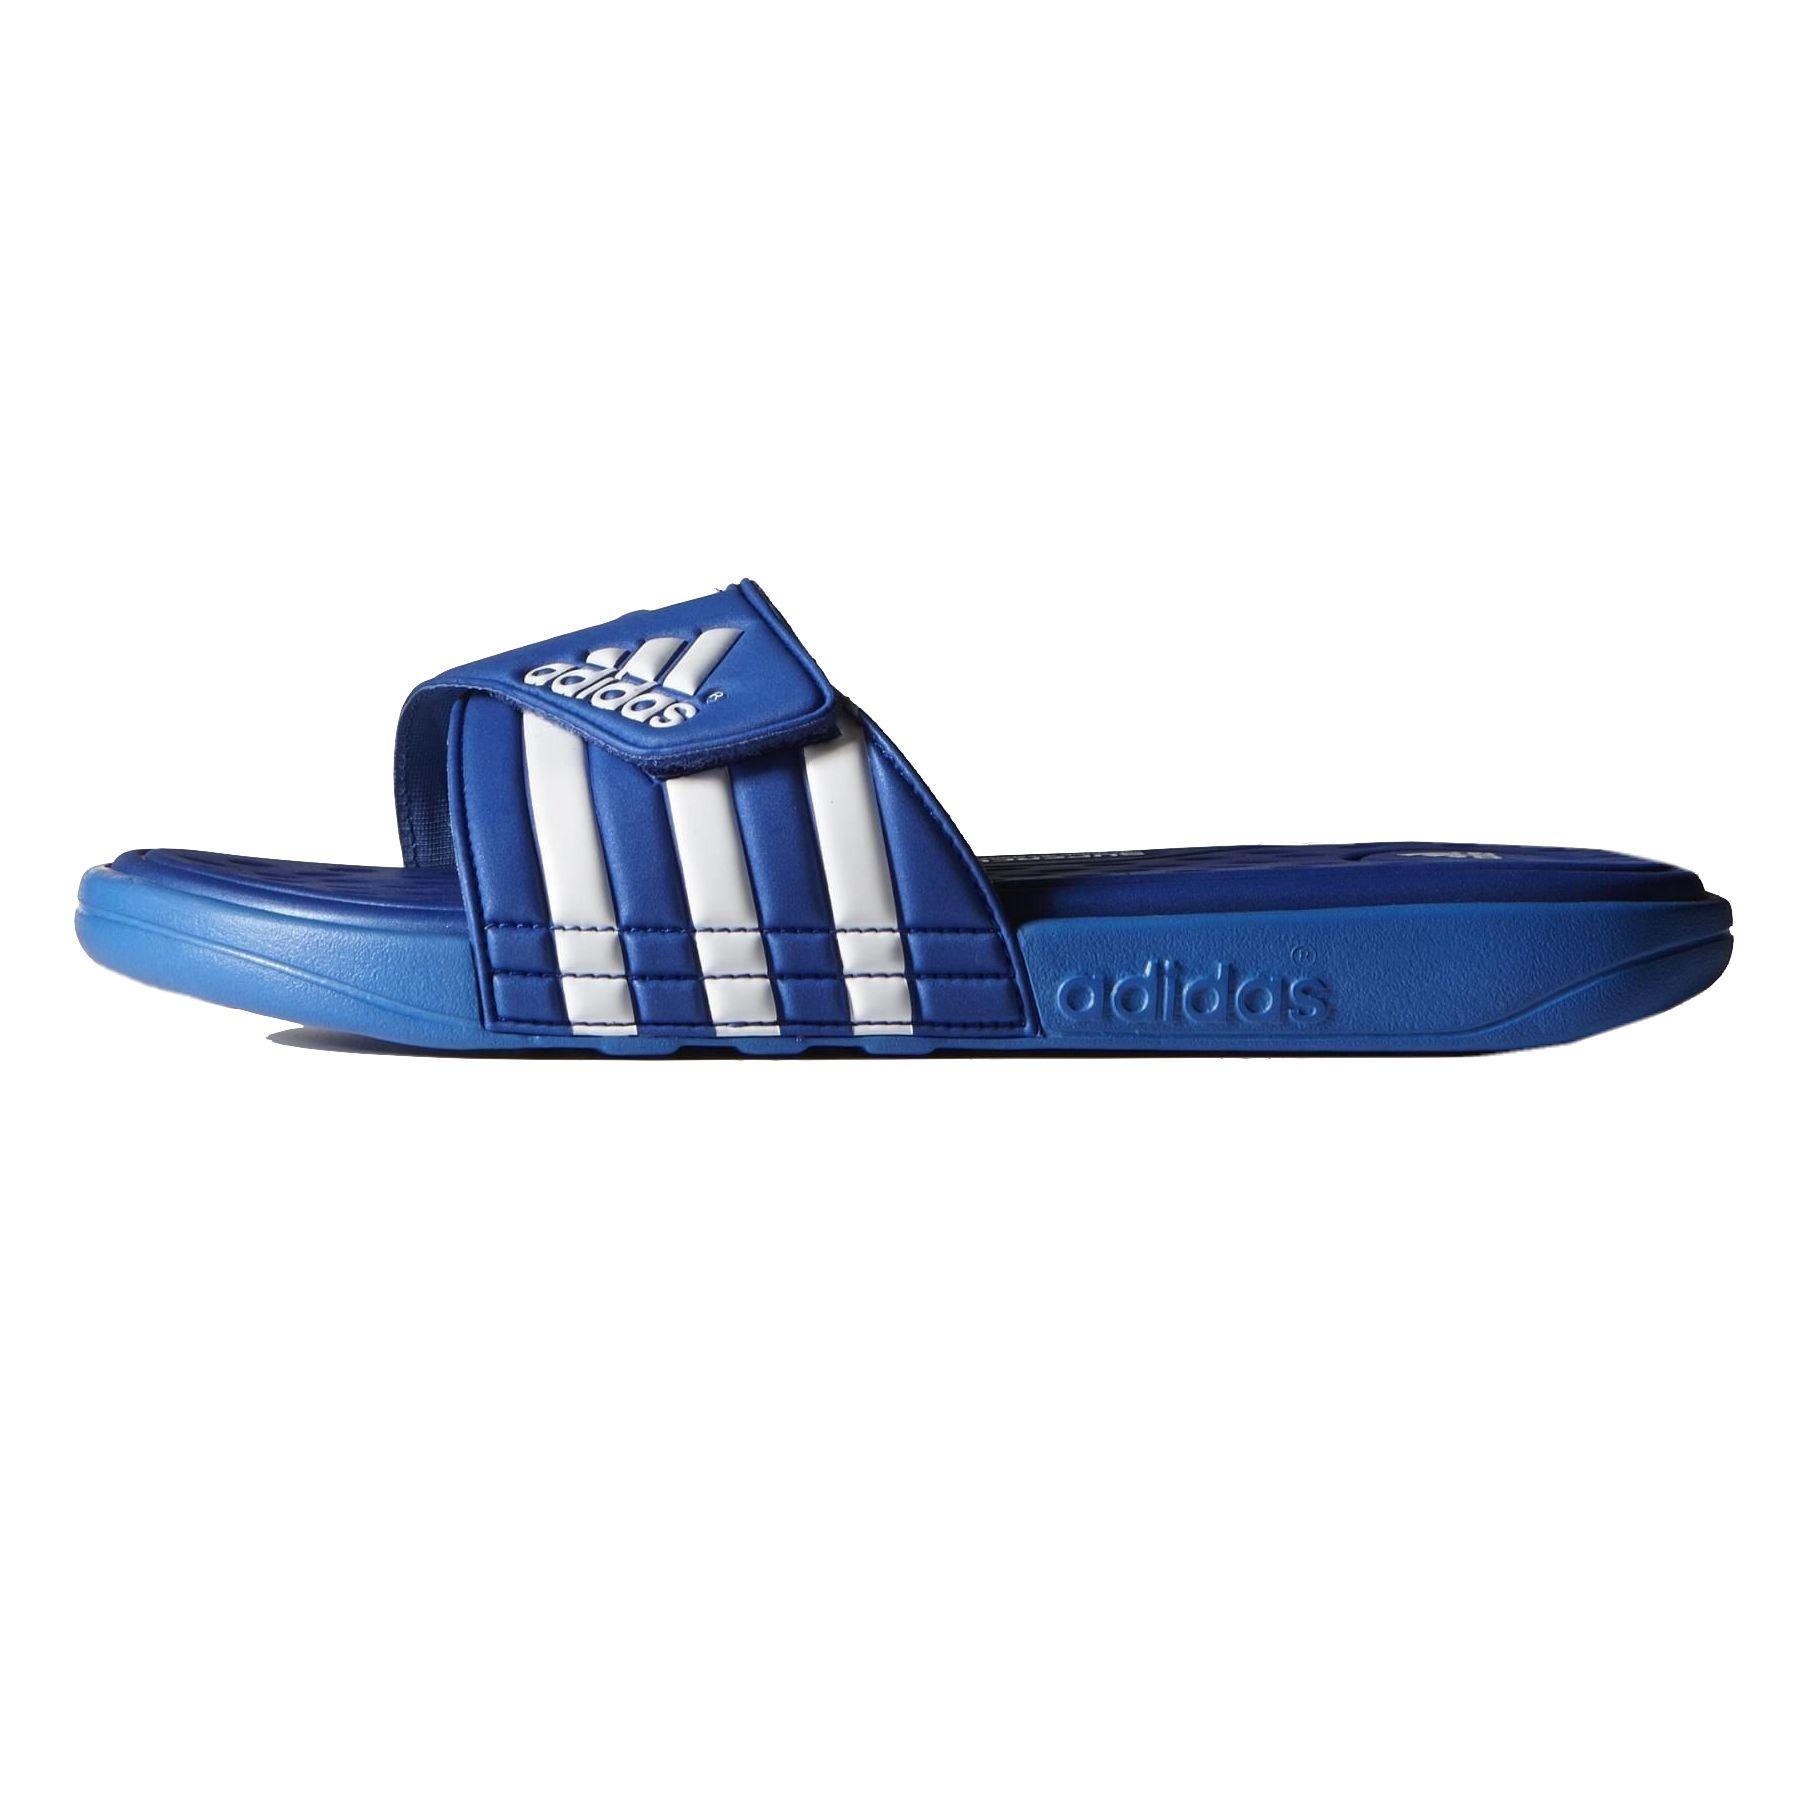 adidas adissage ultrafoam slipper badelatschen badeschuhe herren blau ebay. Black Bedroom Furniture Sets. Home Design Ideas